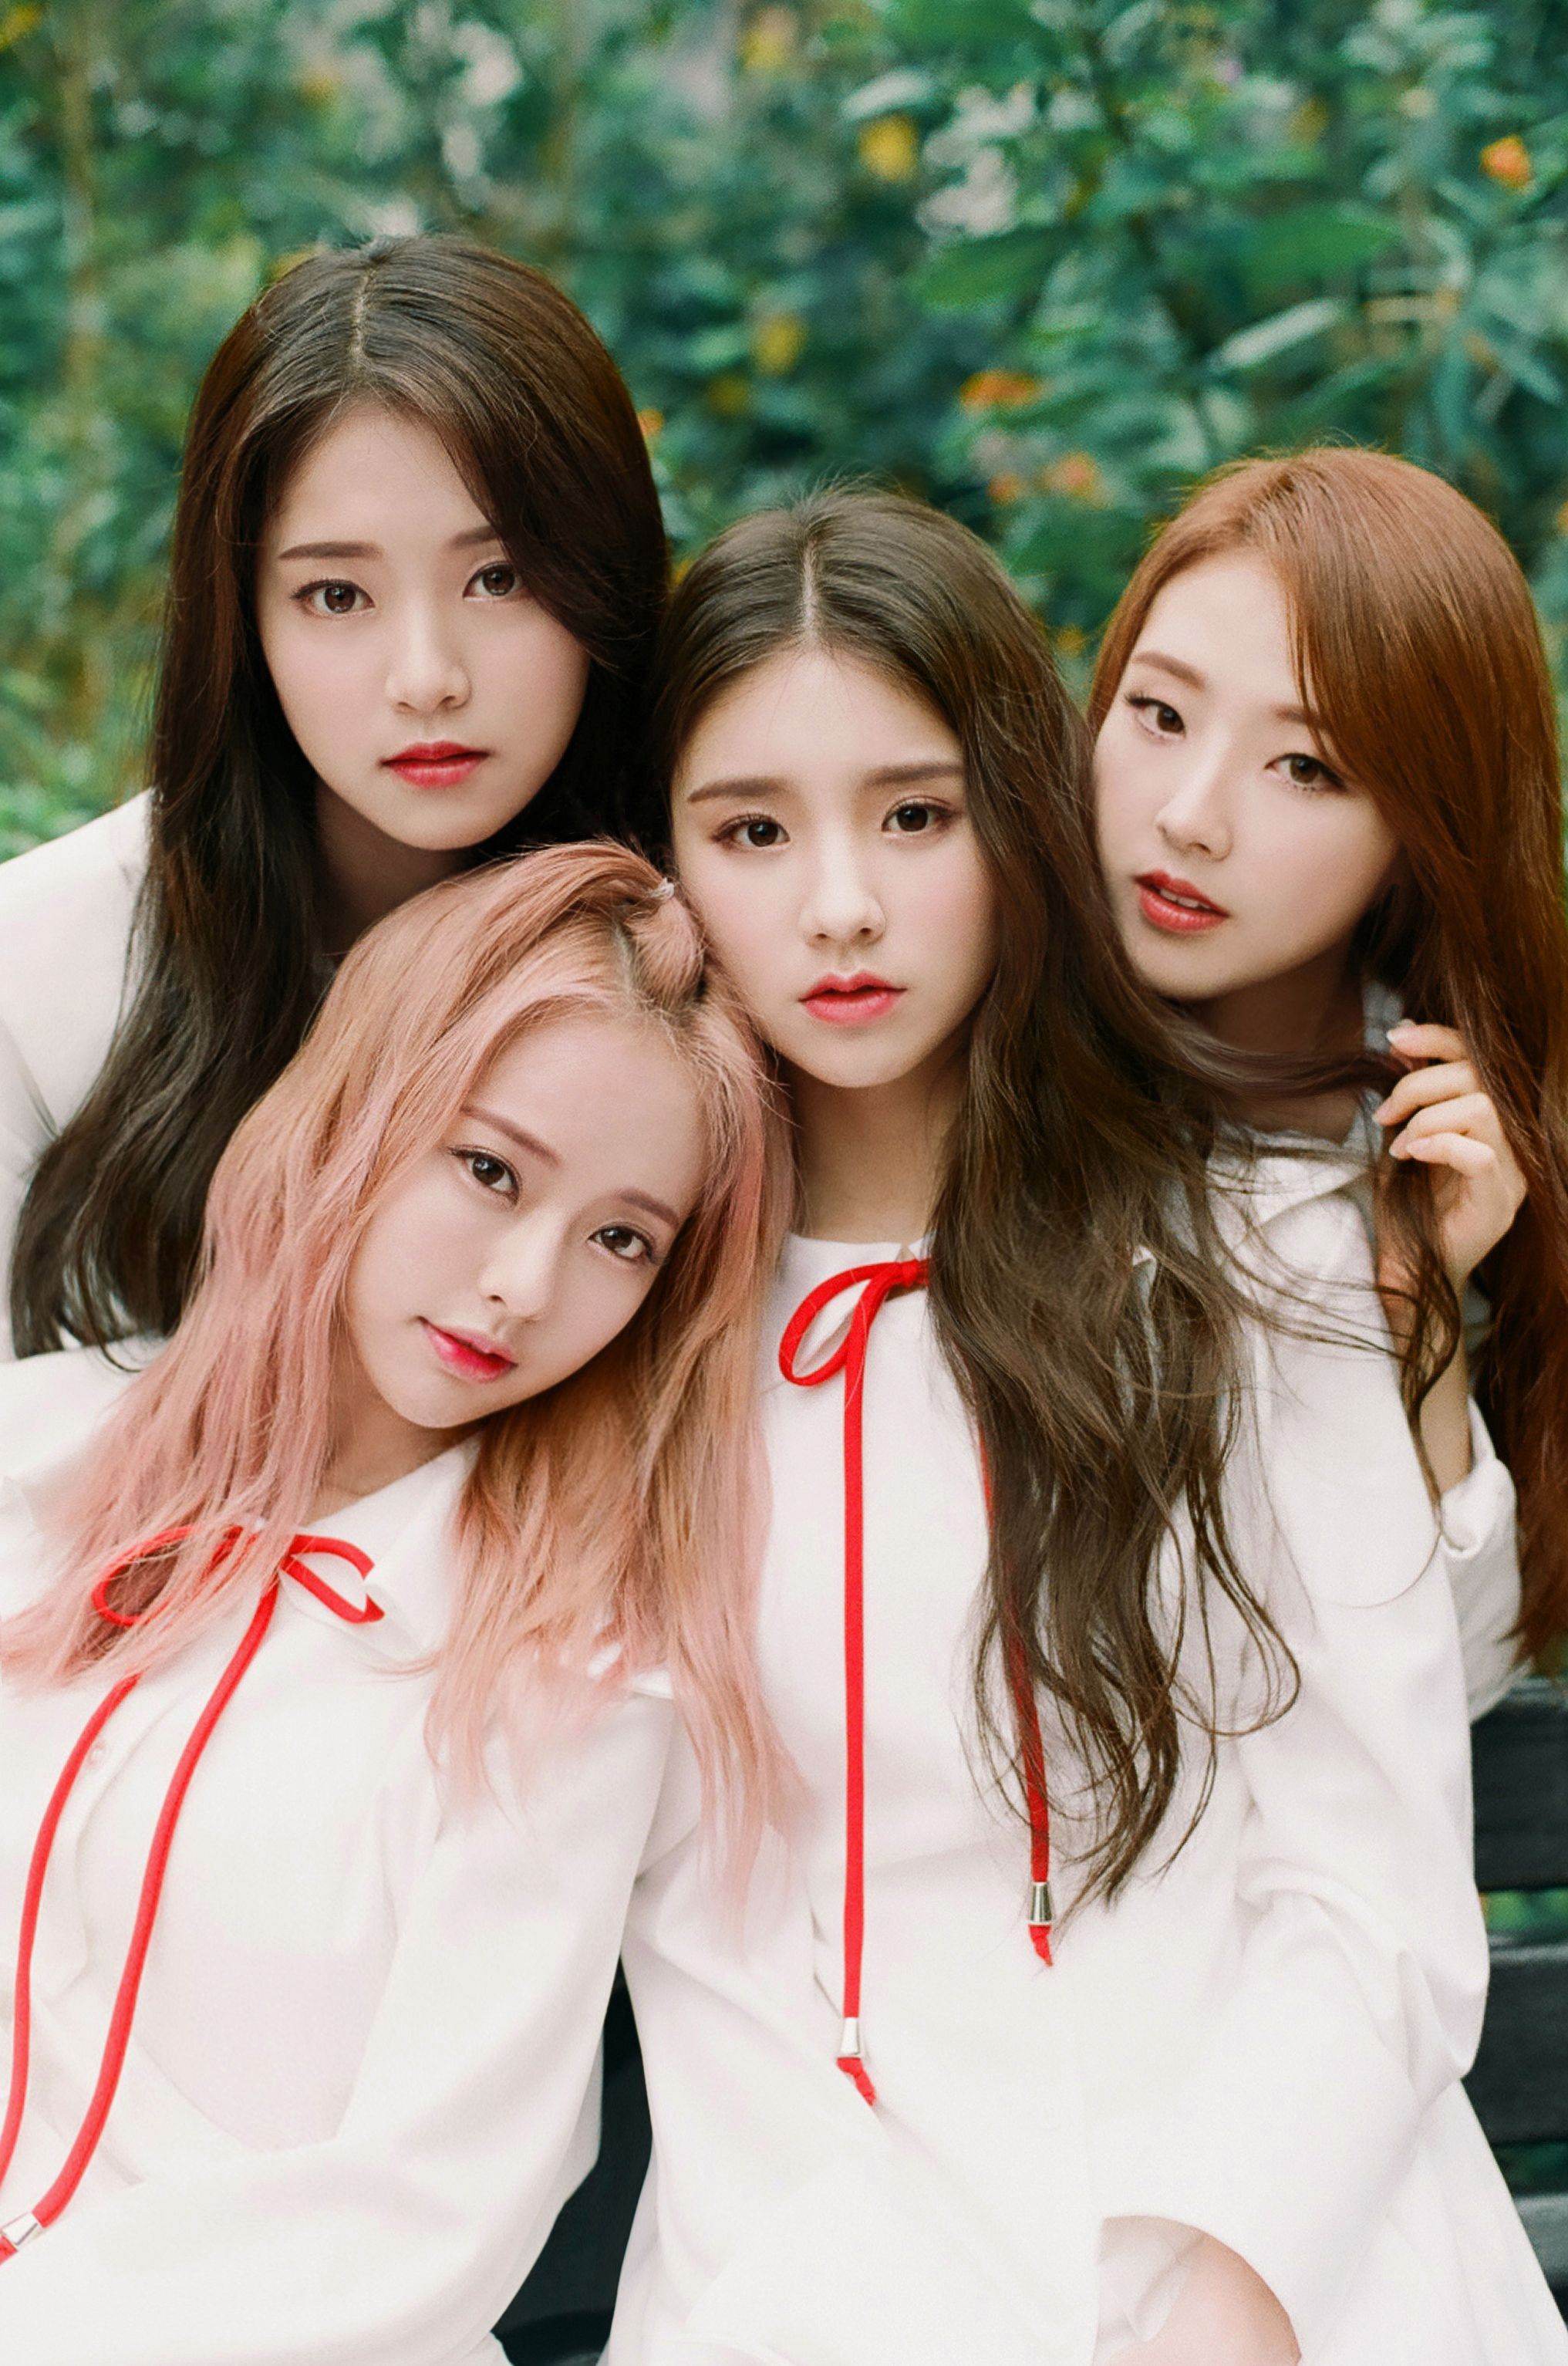 Hd Loopd 1 3 Love Live Promo Pics Kpop Girl Groups Kpop Girls Korean Girl Groups